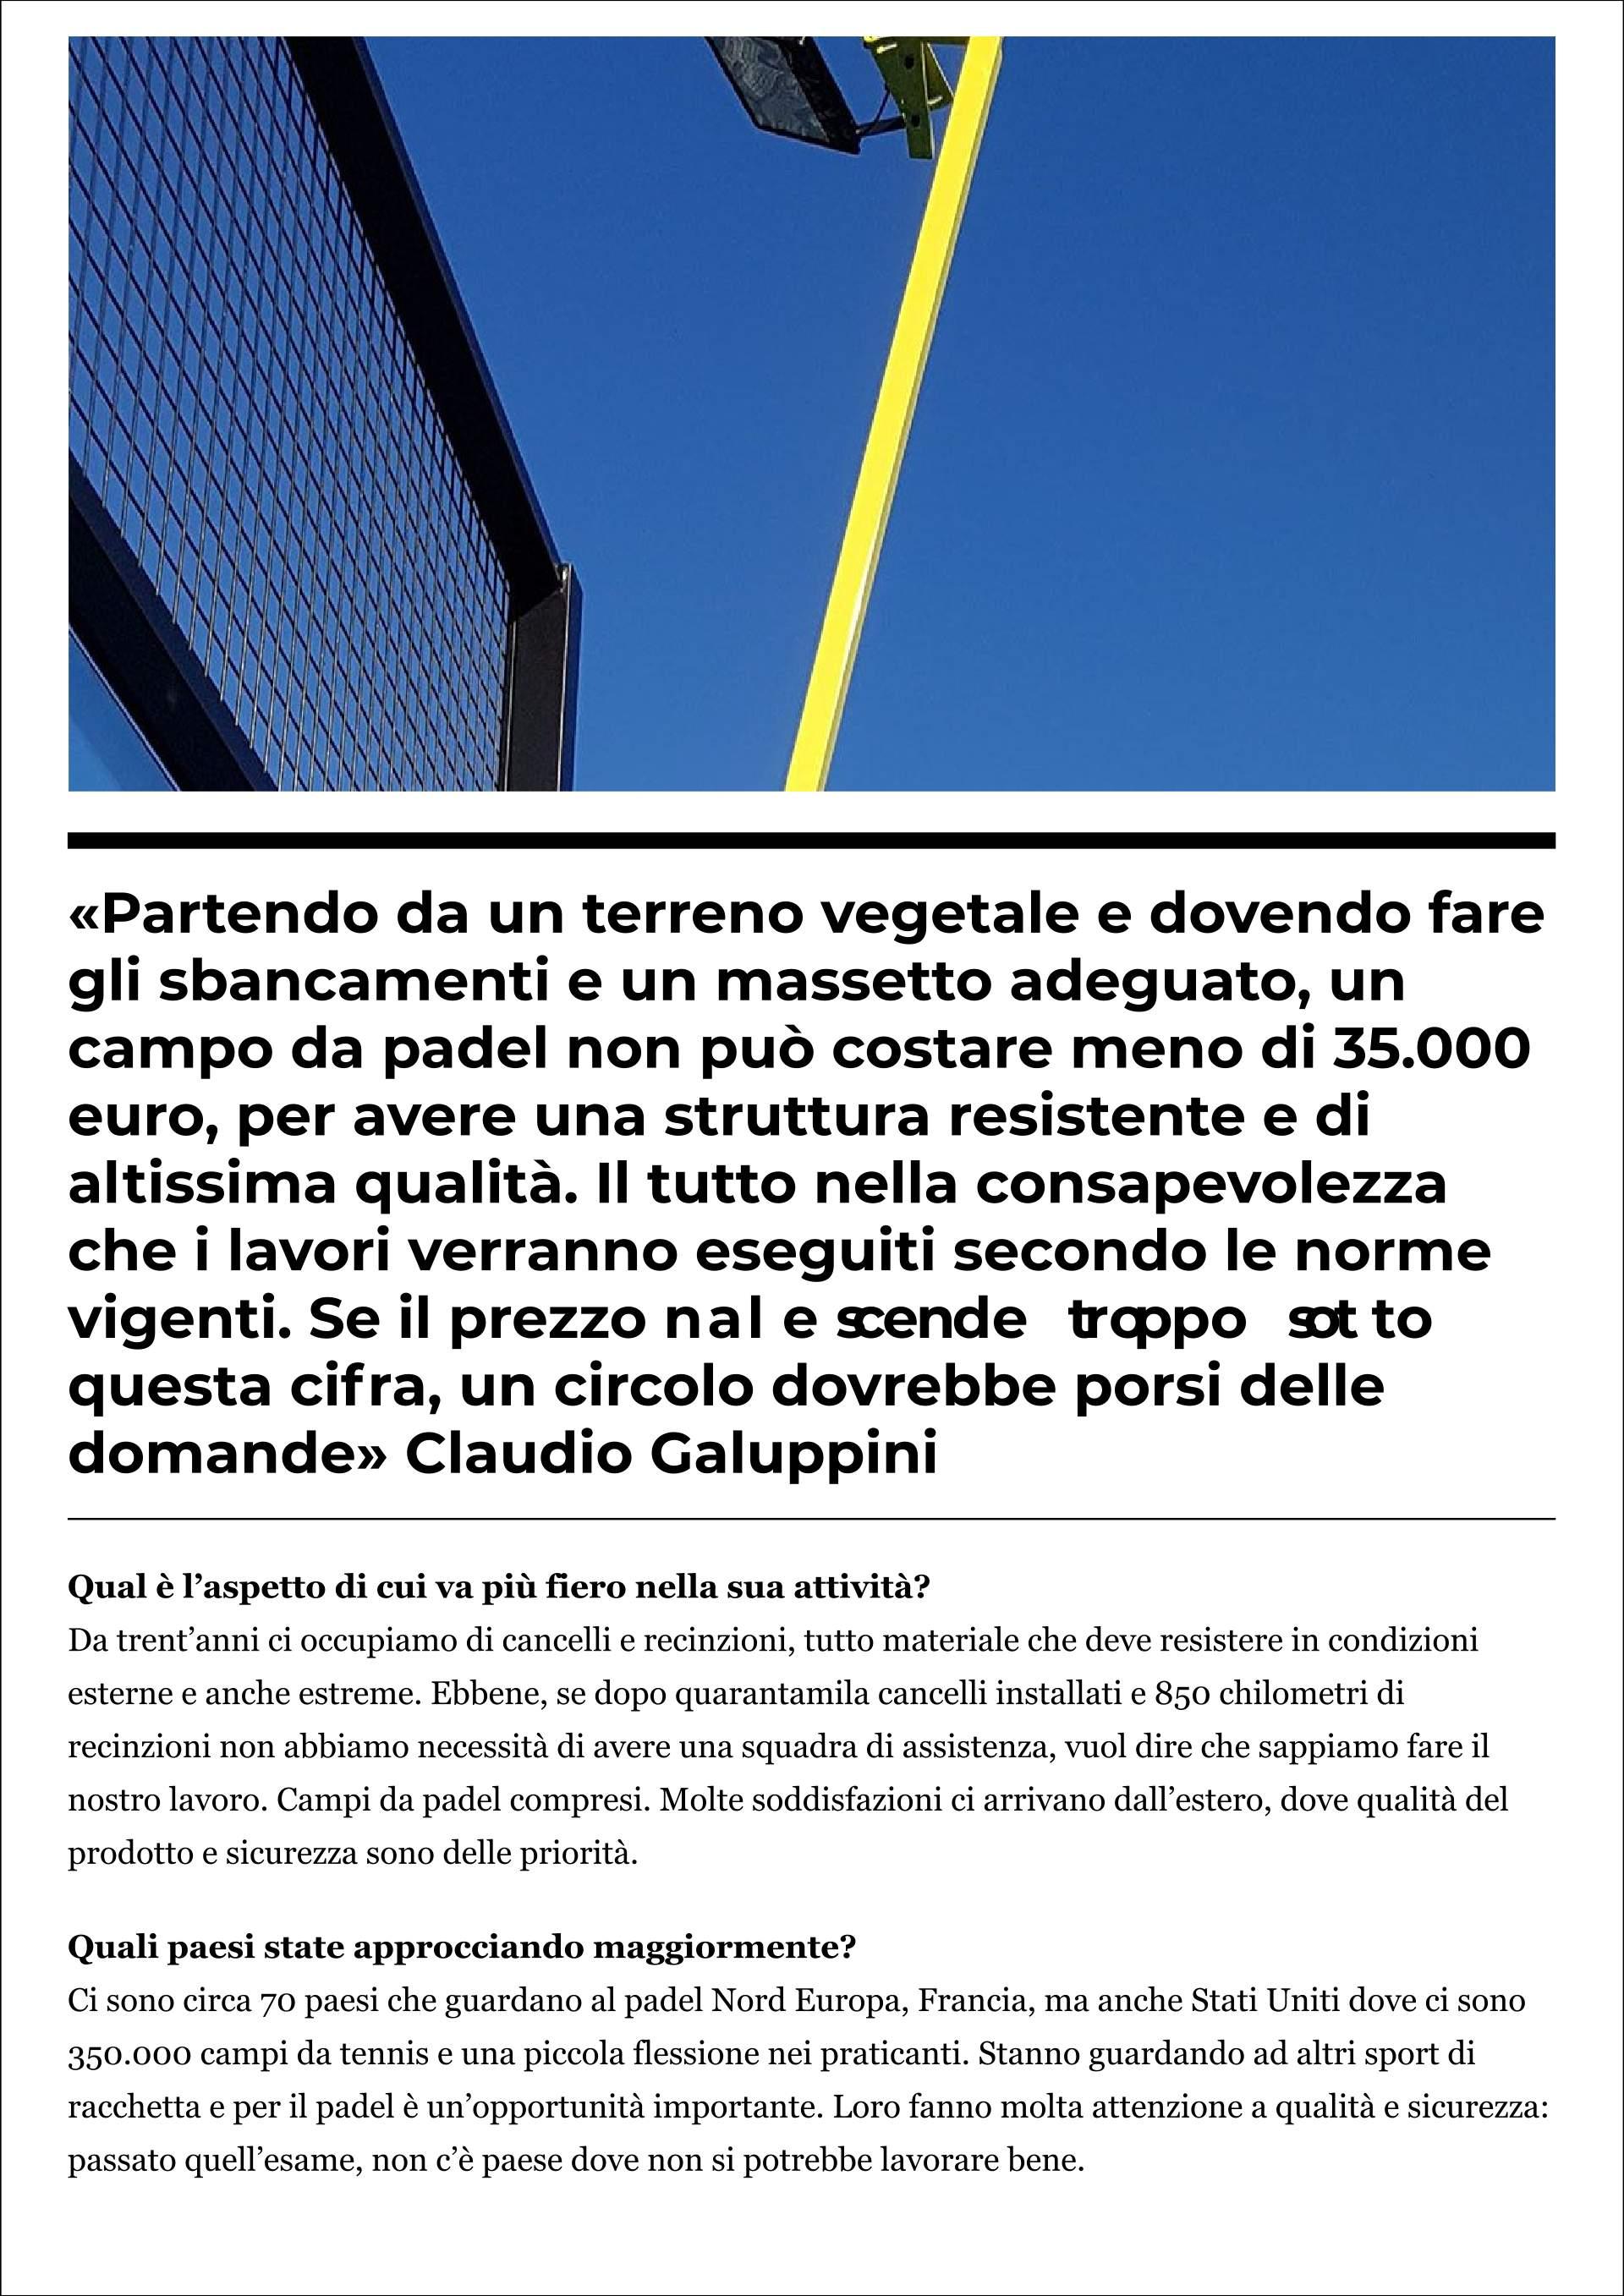 The Leader: Italian Padel (Padel Magazine - 5 novembre 2019) - 5